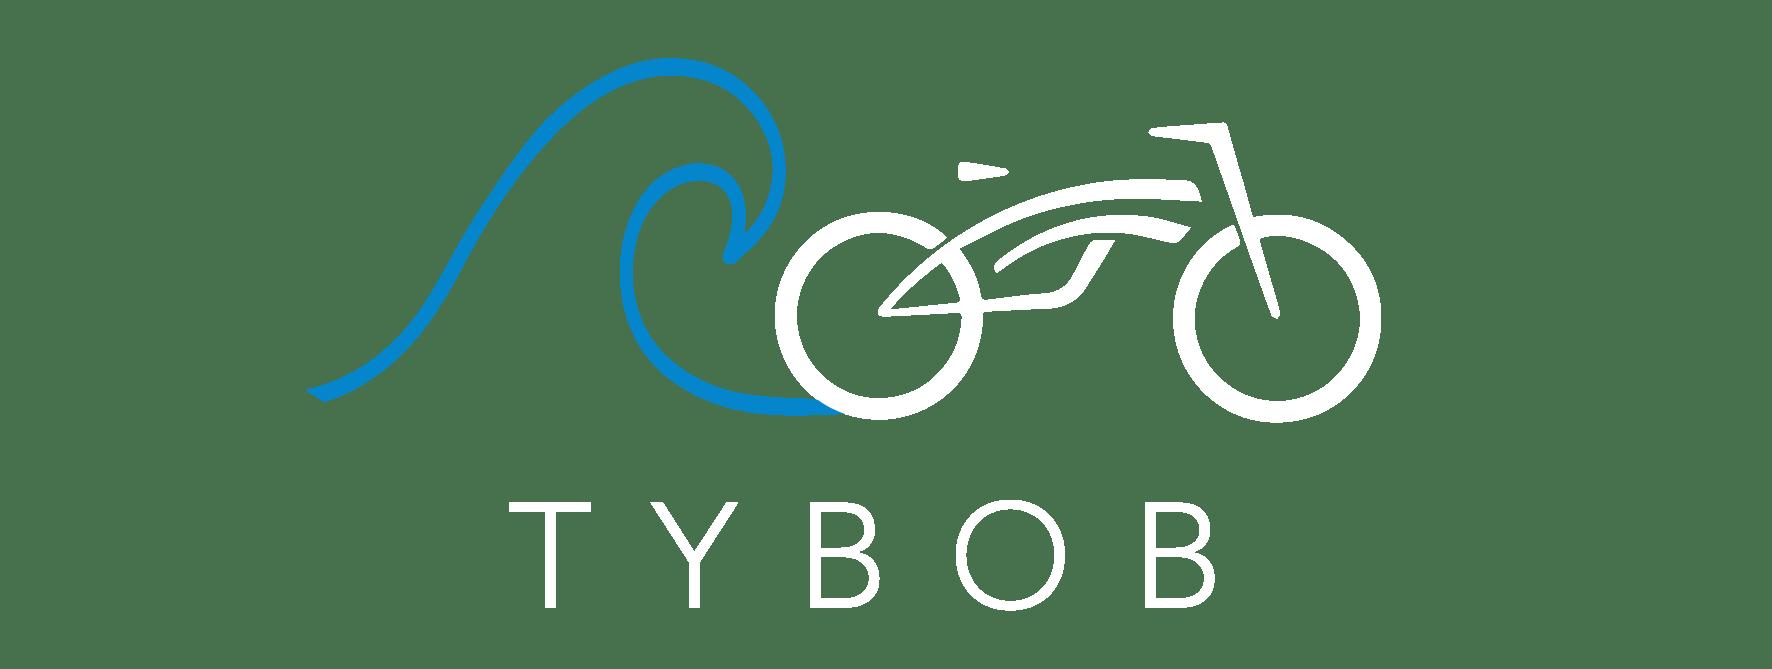 cropped-TYBOB_logo_WHITE_Obszar-roboczy-1.png